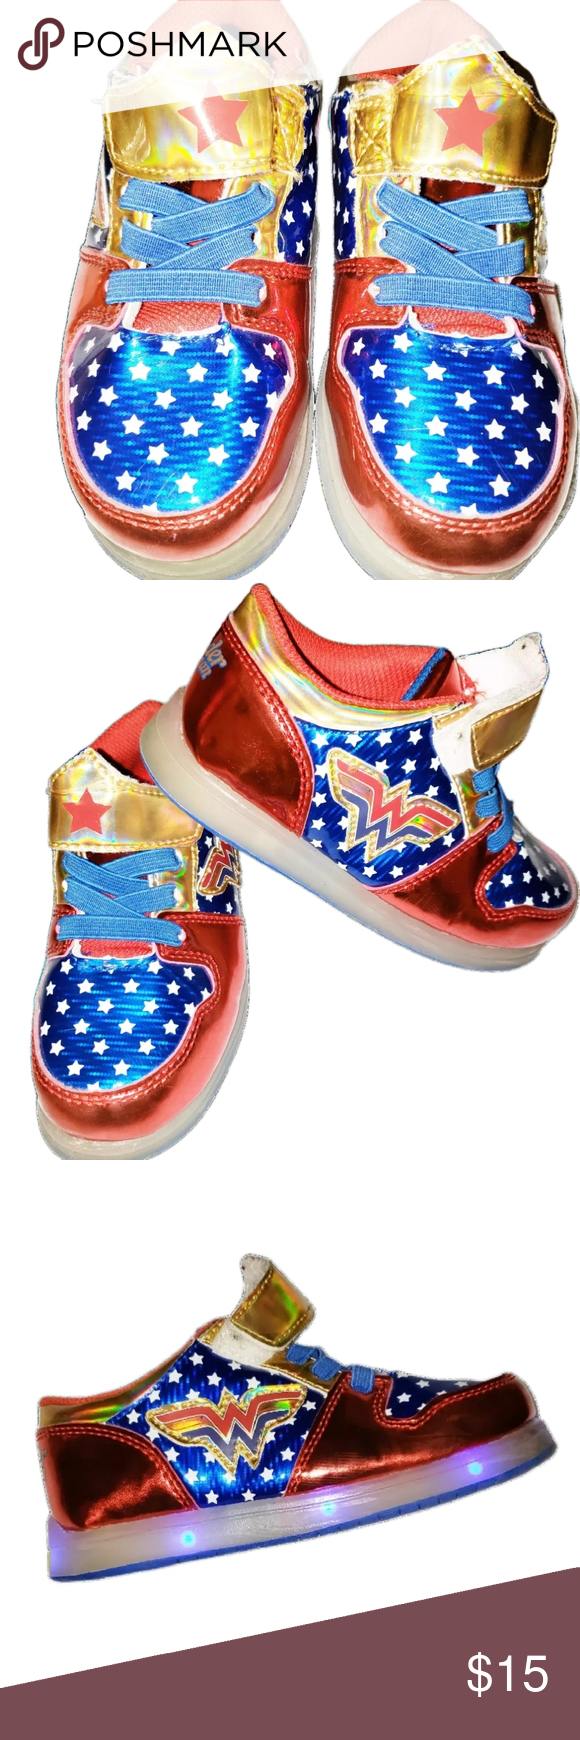 light up wonder woman shoes